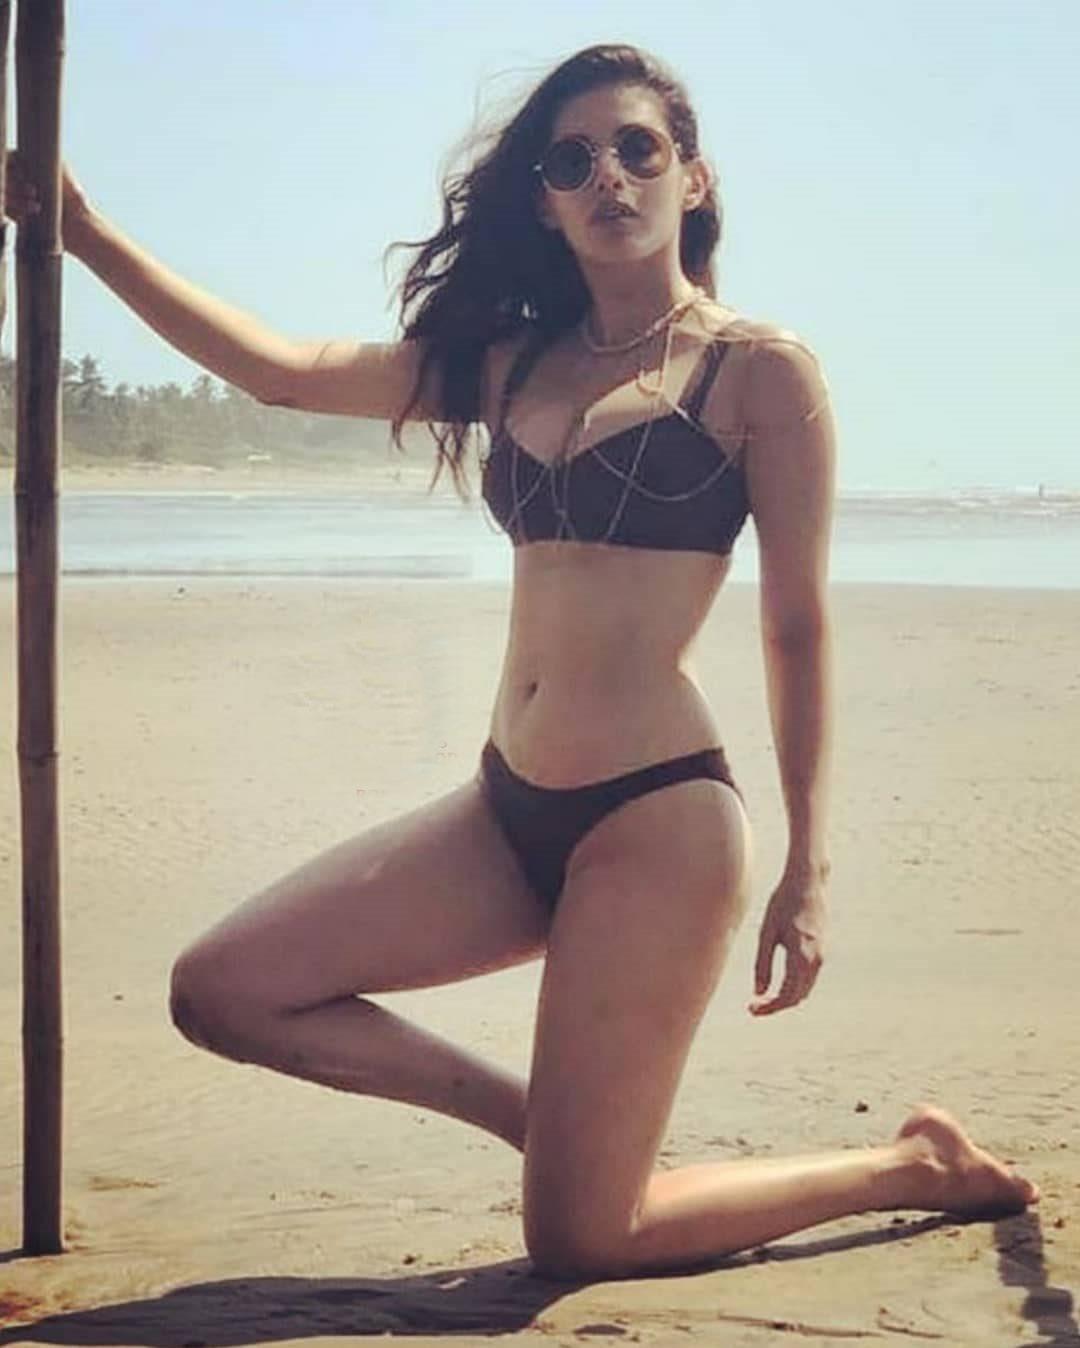 amyra-dastur-posing-in-bikini-at-beach